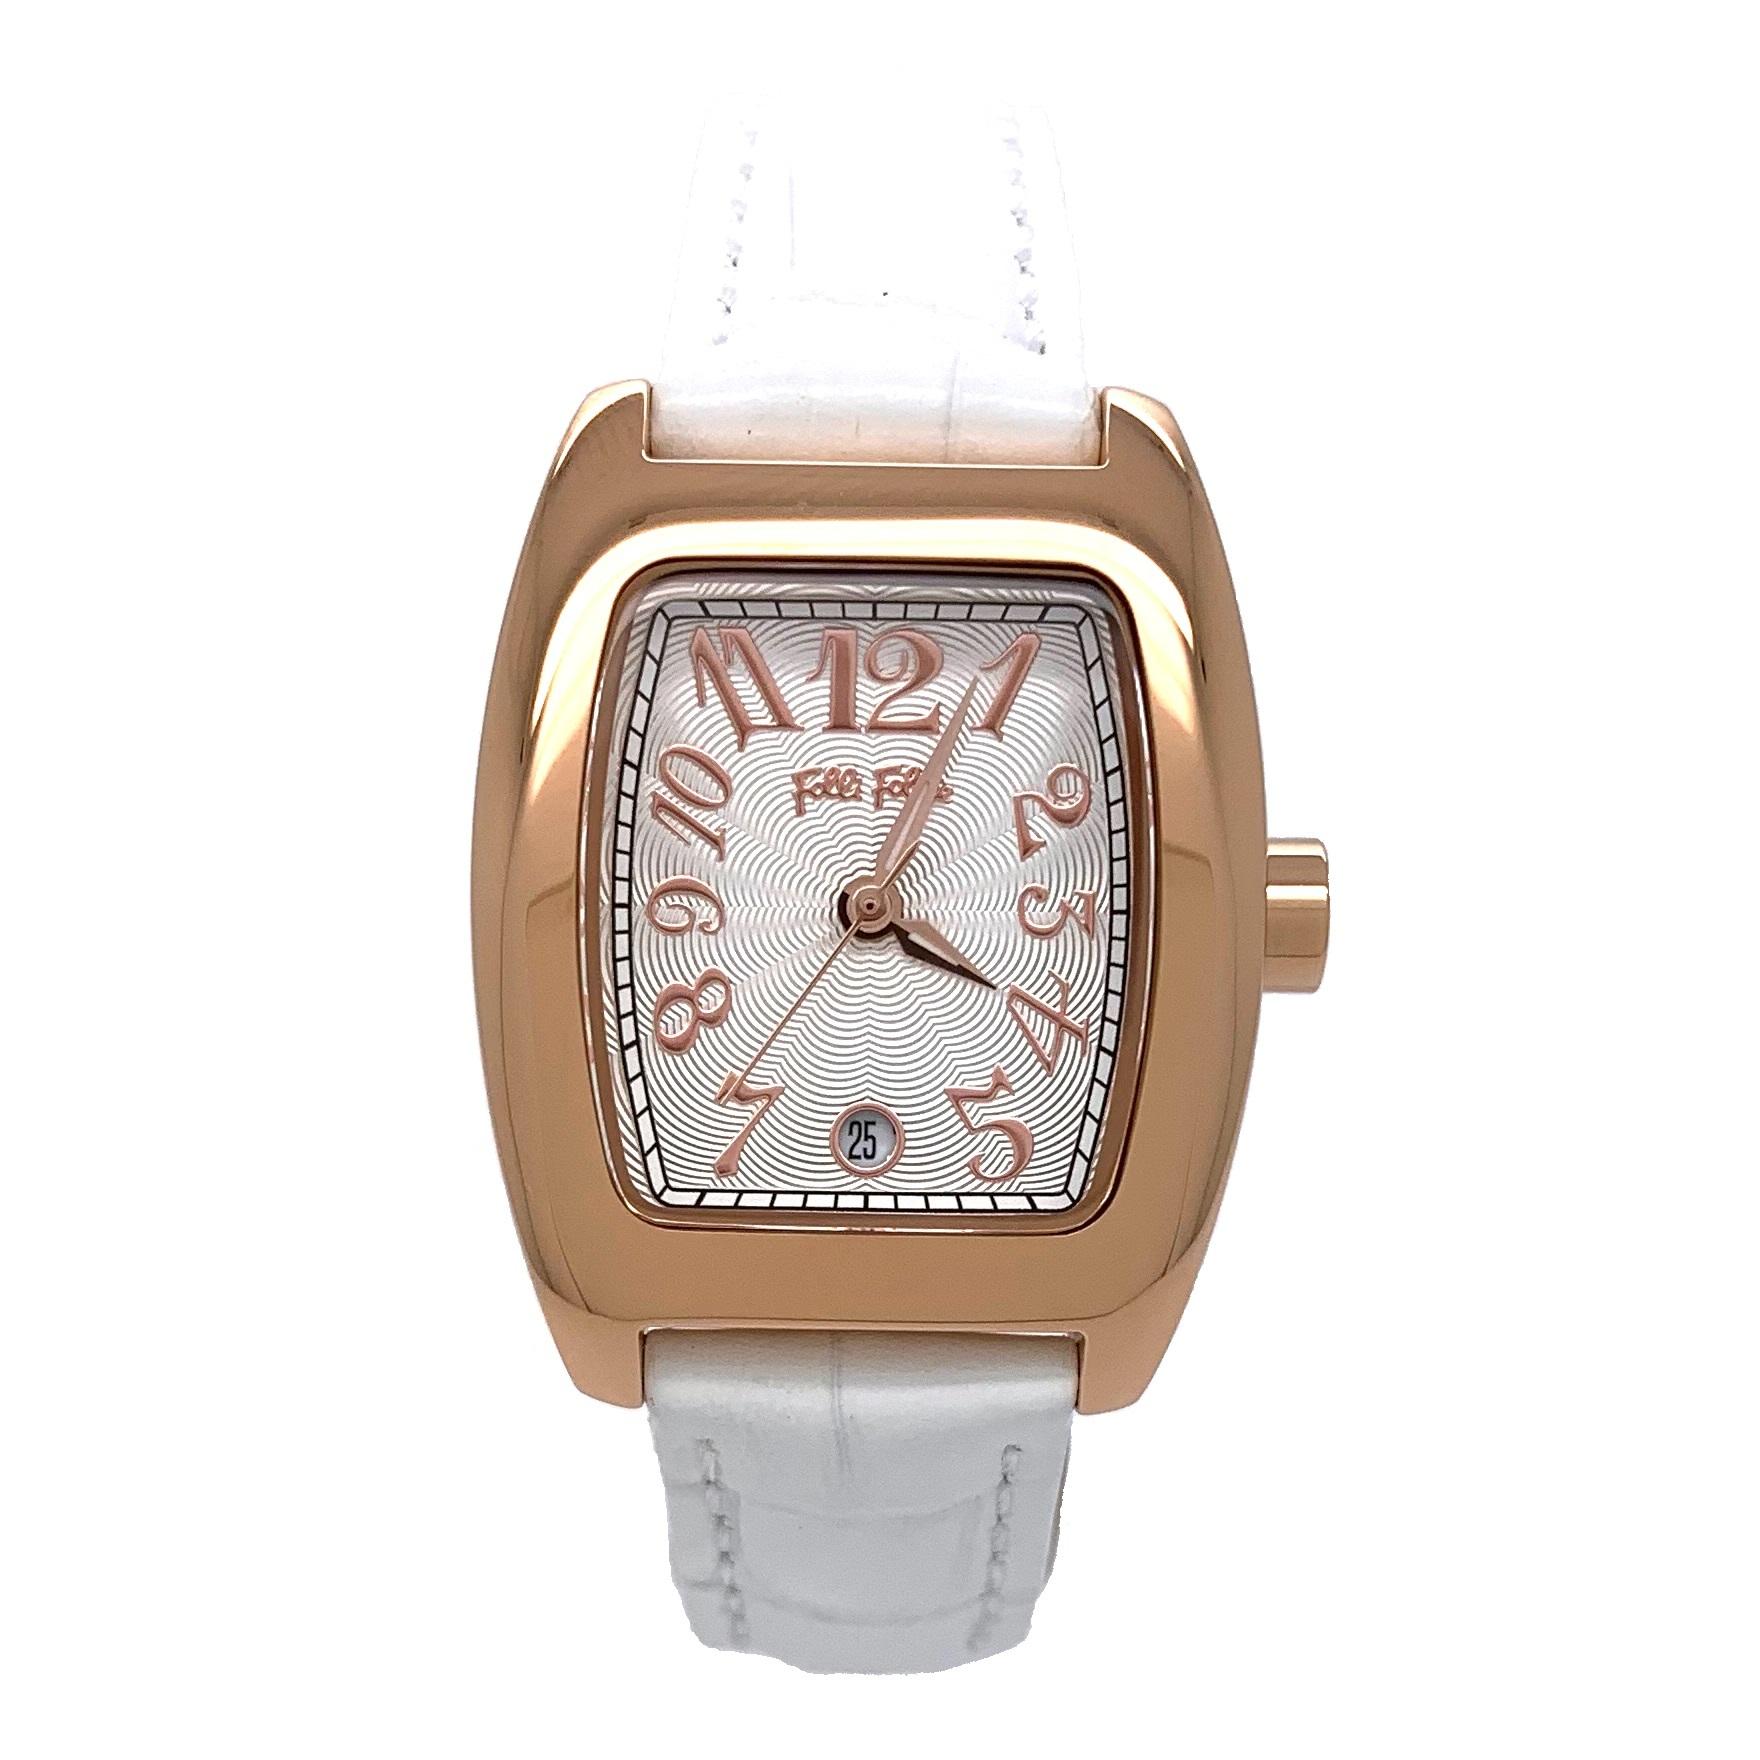 6683c340e8 2年保証 新作 新品 FolliFollie フォリフォリ 腕時計 レディース DEBUTANT デビュタント S922 WF5R080SDS  WF5R080SDS-WH White ホワイト 白 Rose Gold ローズゴールド ...